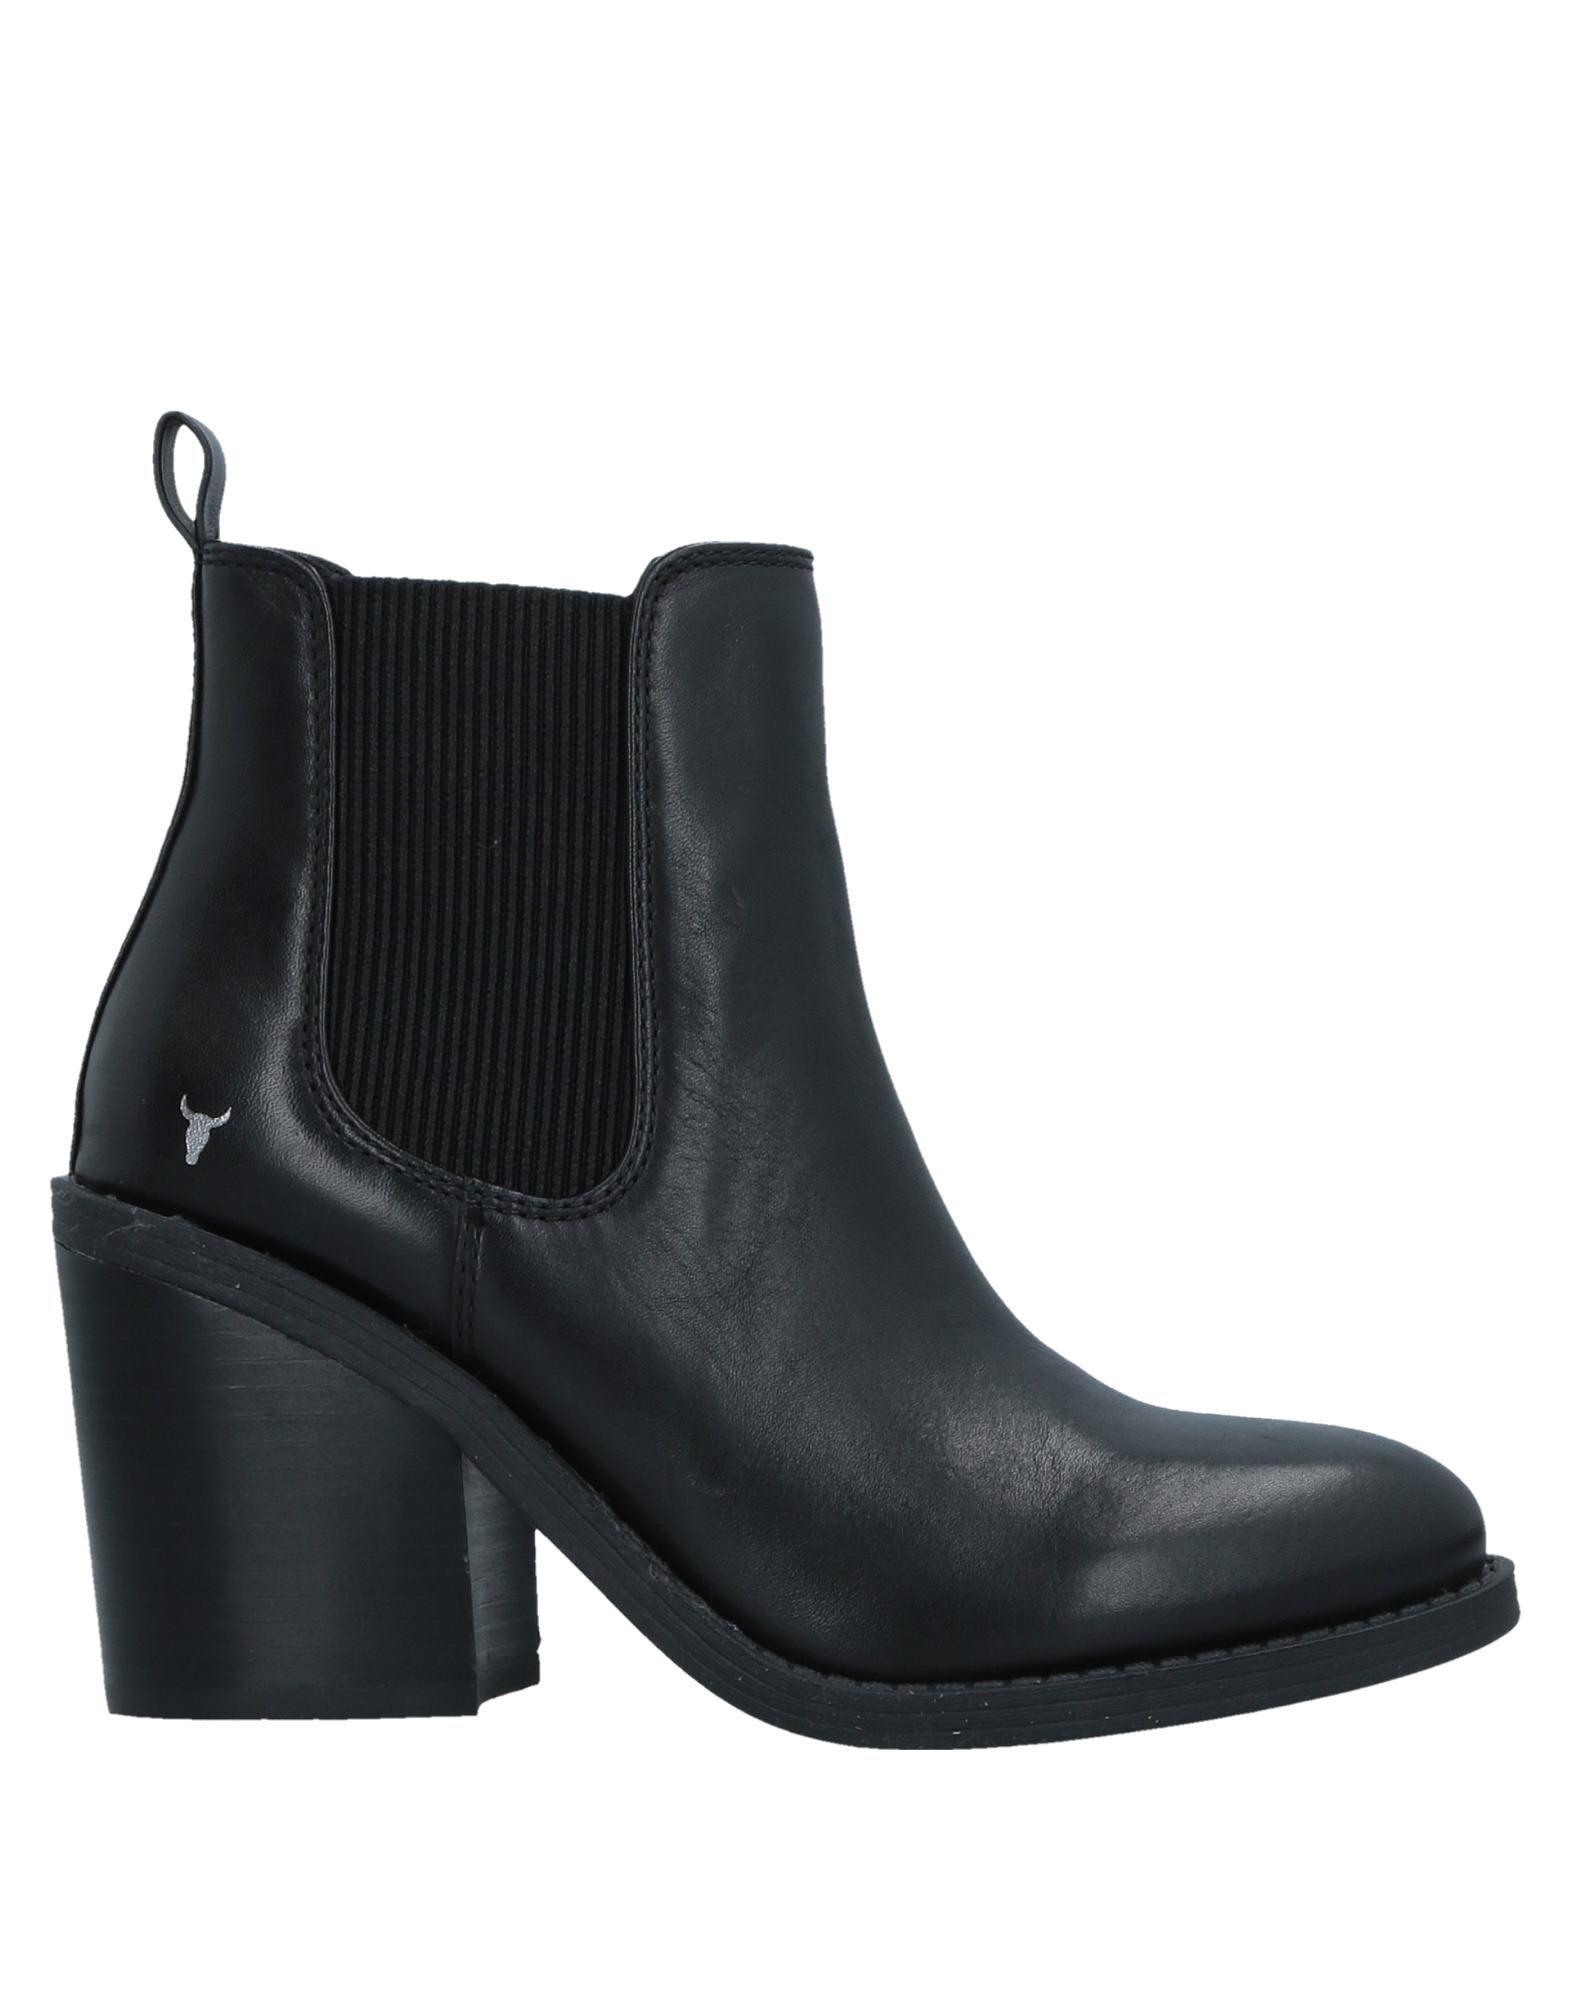 Windsor Smith Stiefelette Damen  Schuhe 11532142DU Gute Qualität beliebte Schuhe  56a078